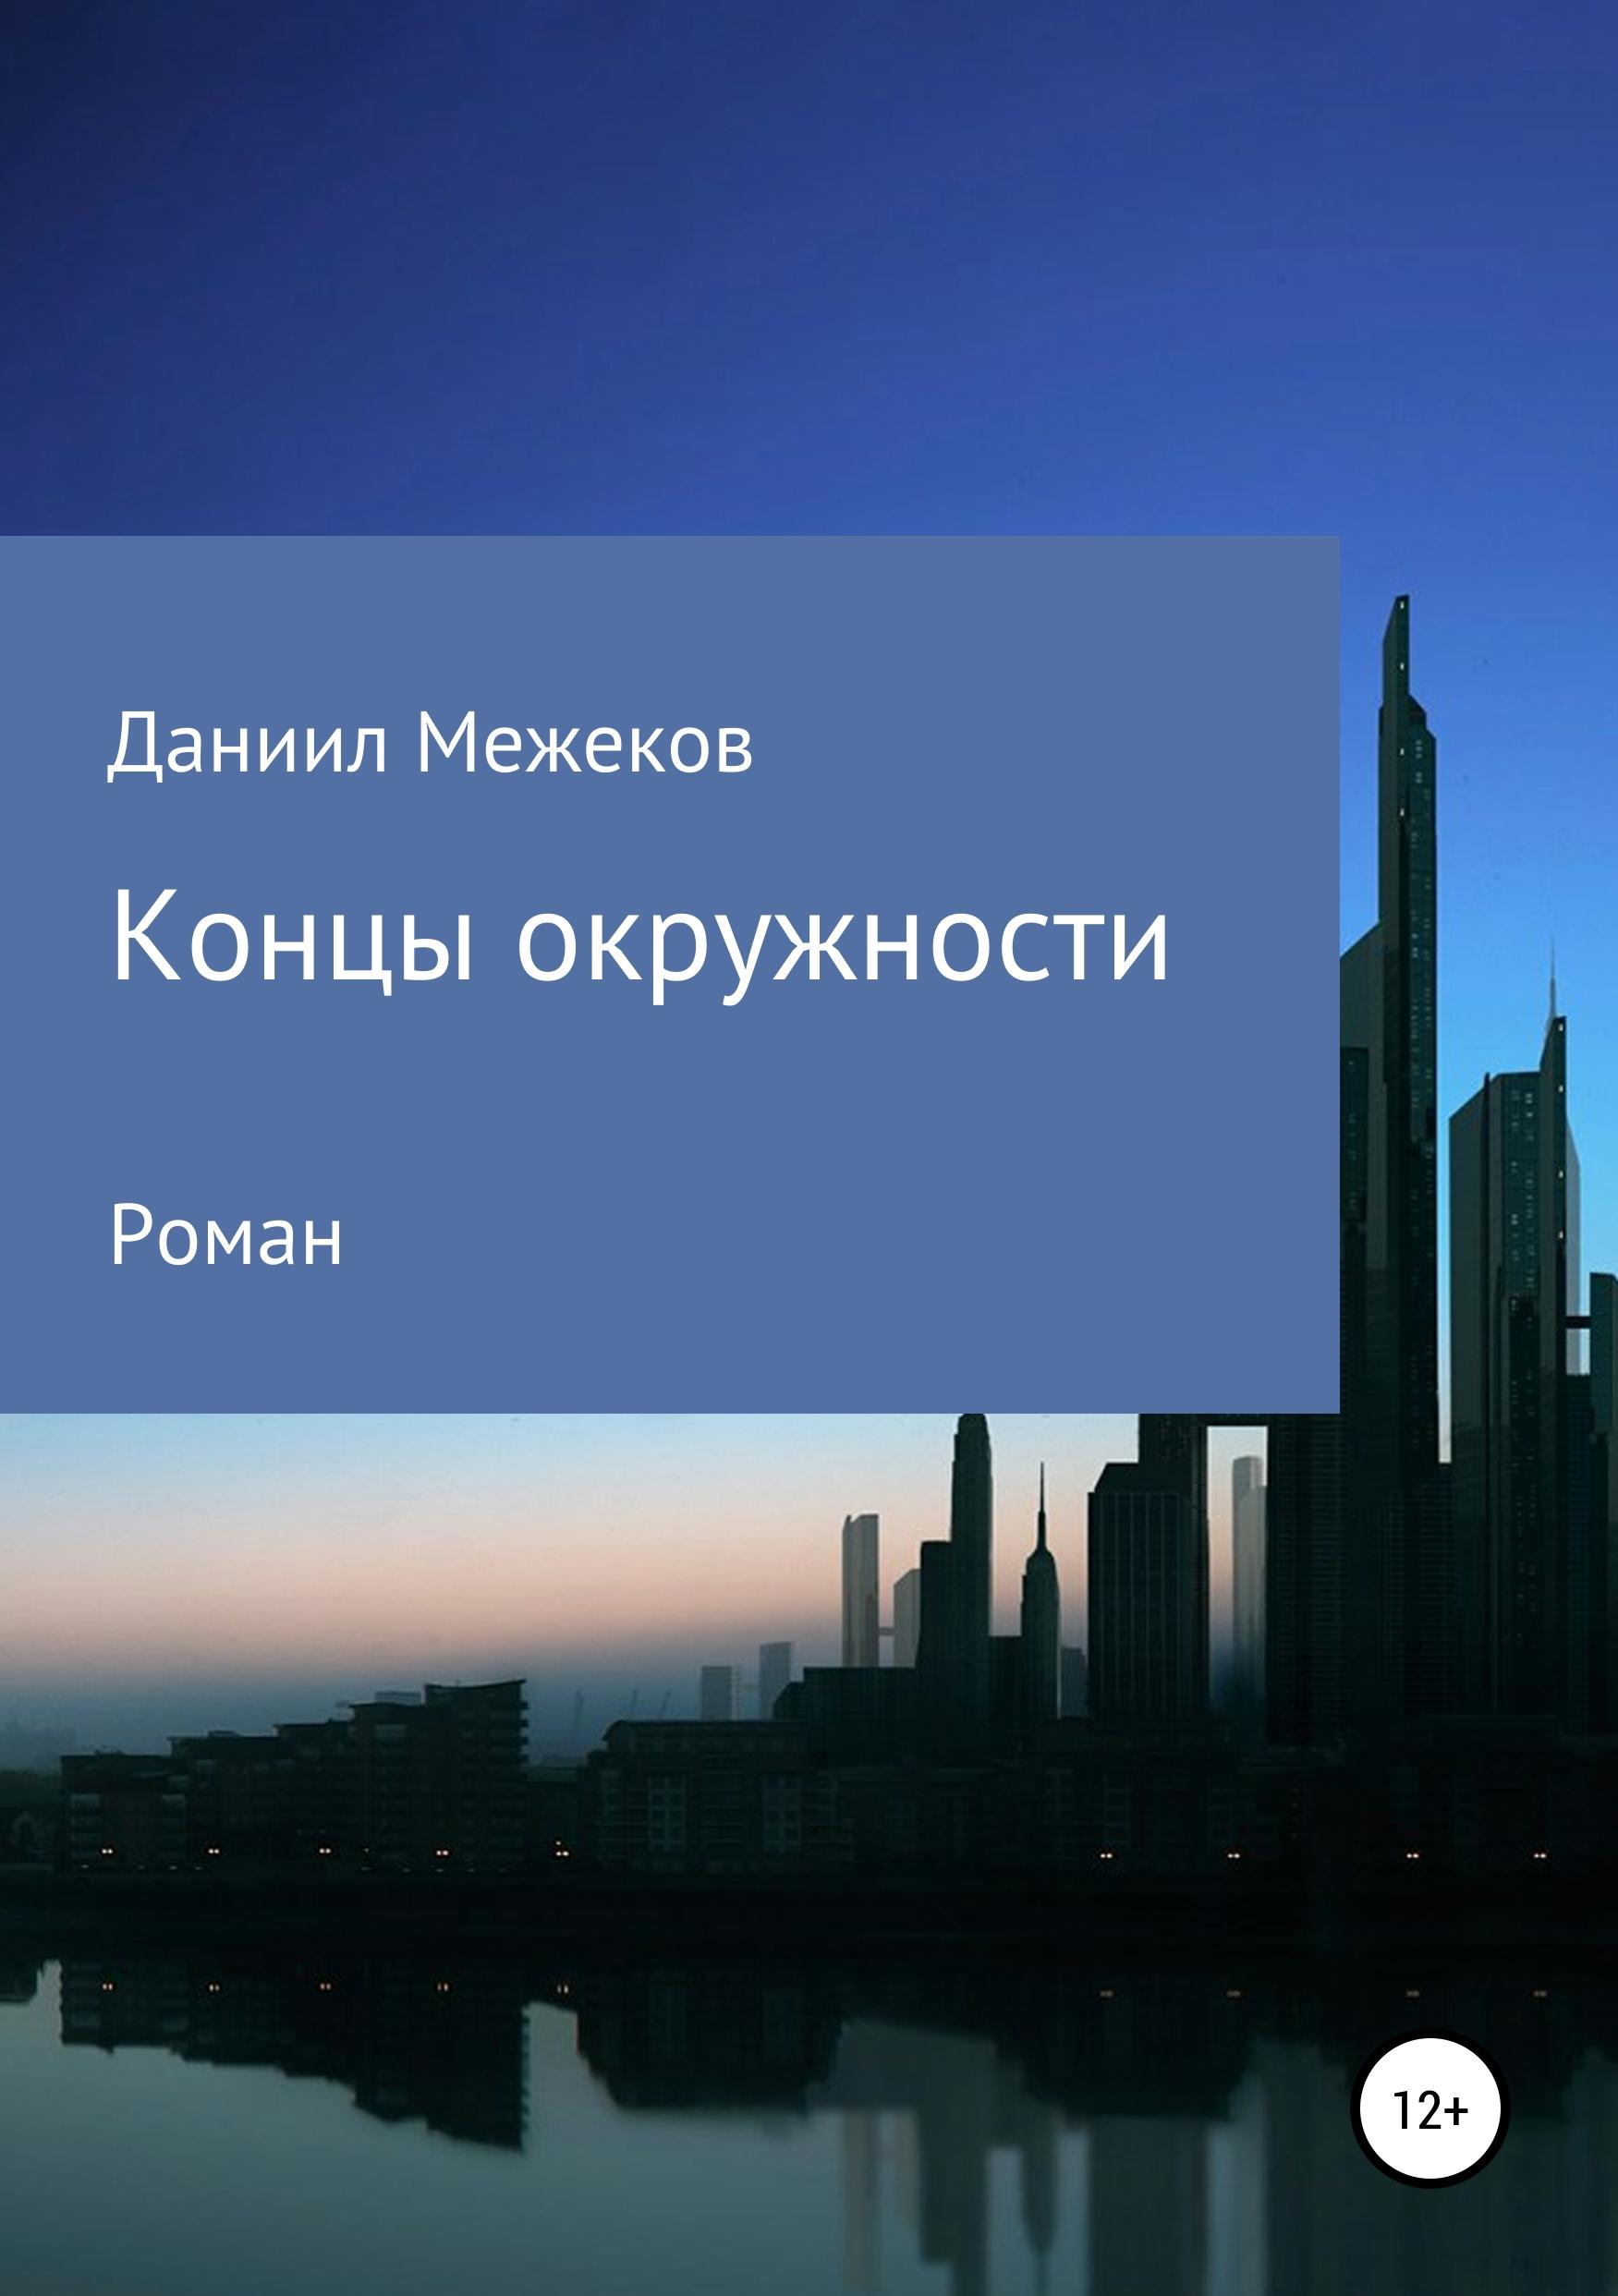 цена на Даниил Александрович Межеков Концы окружности